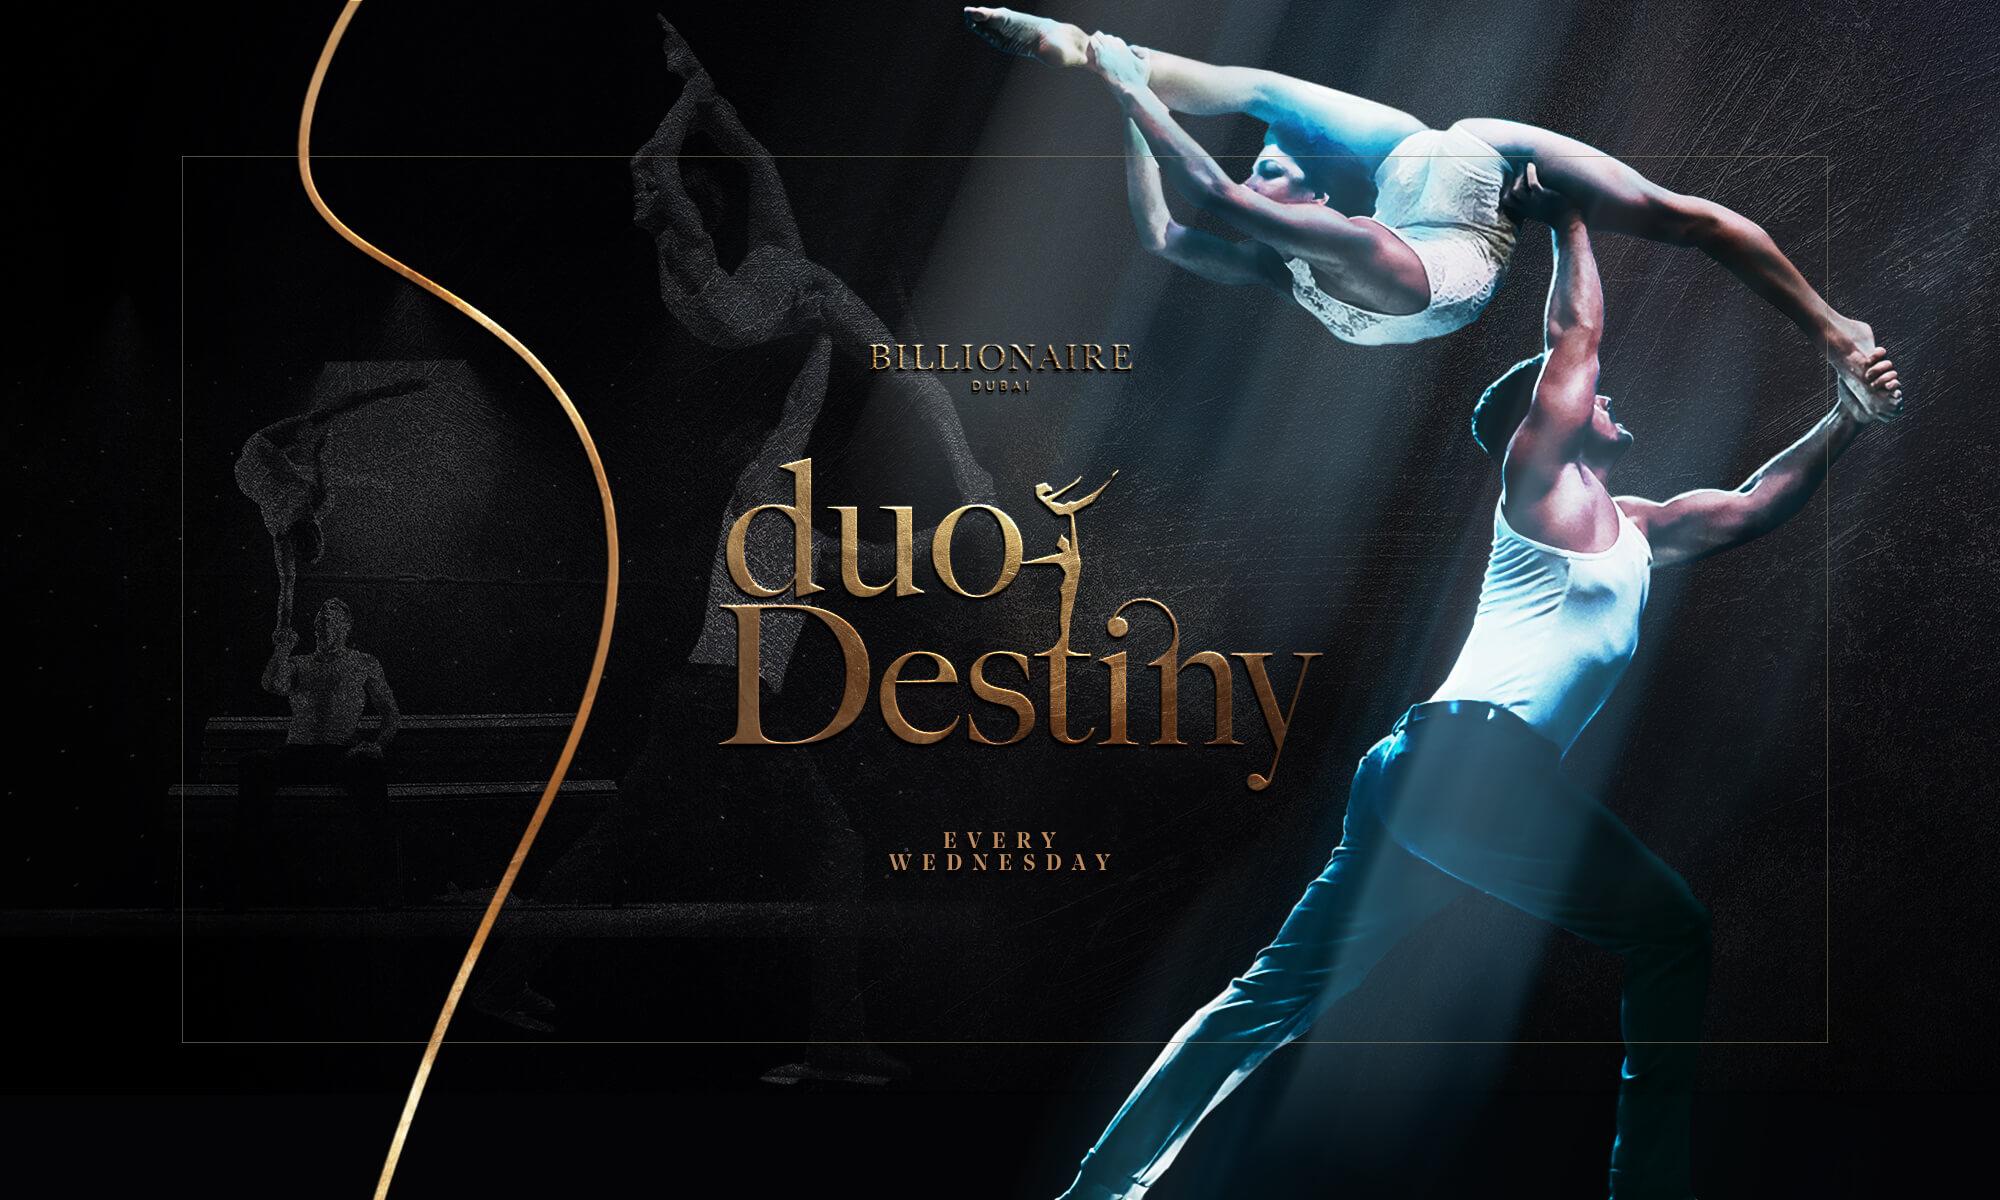 Duo Destiny every Wednesday at Billionaire Dubai